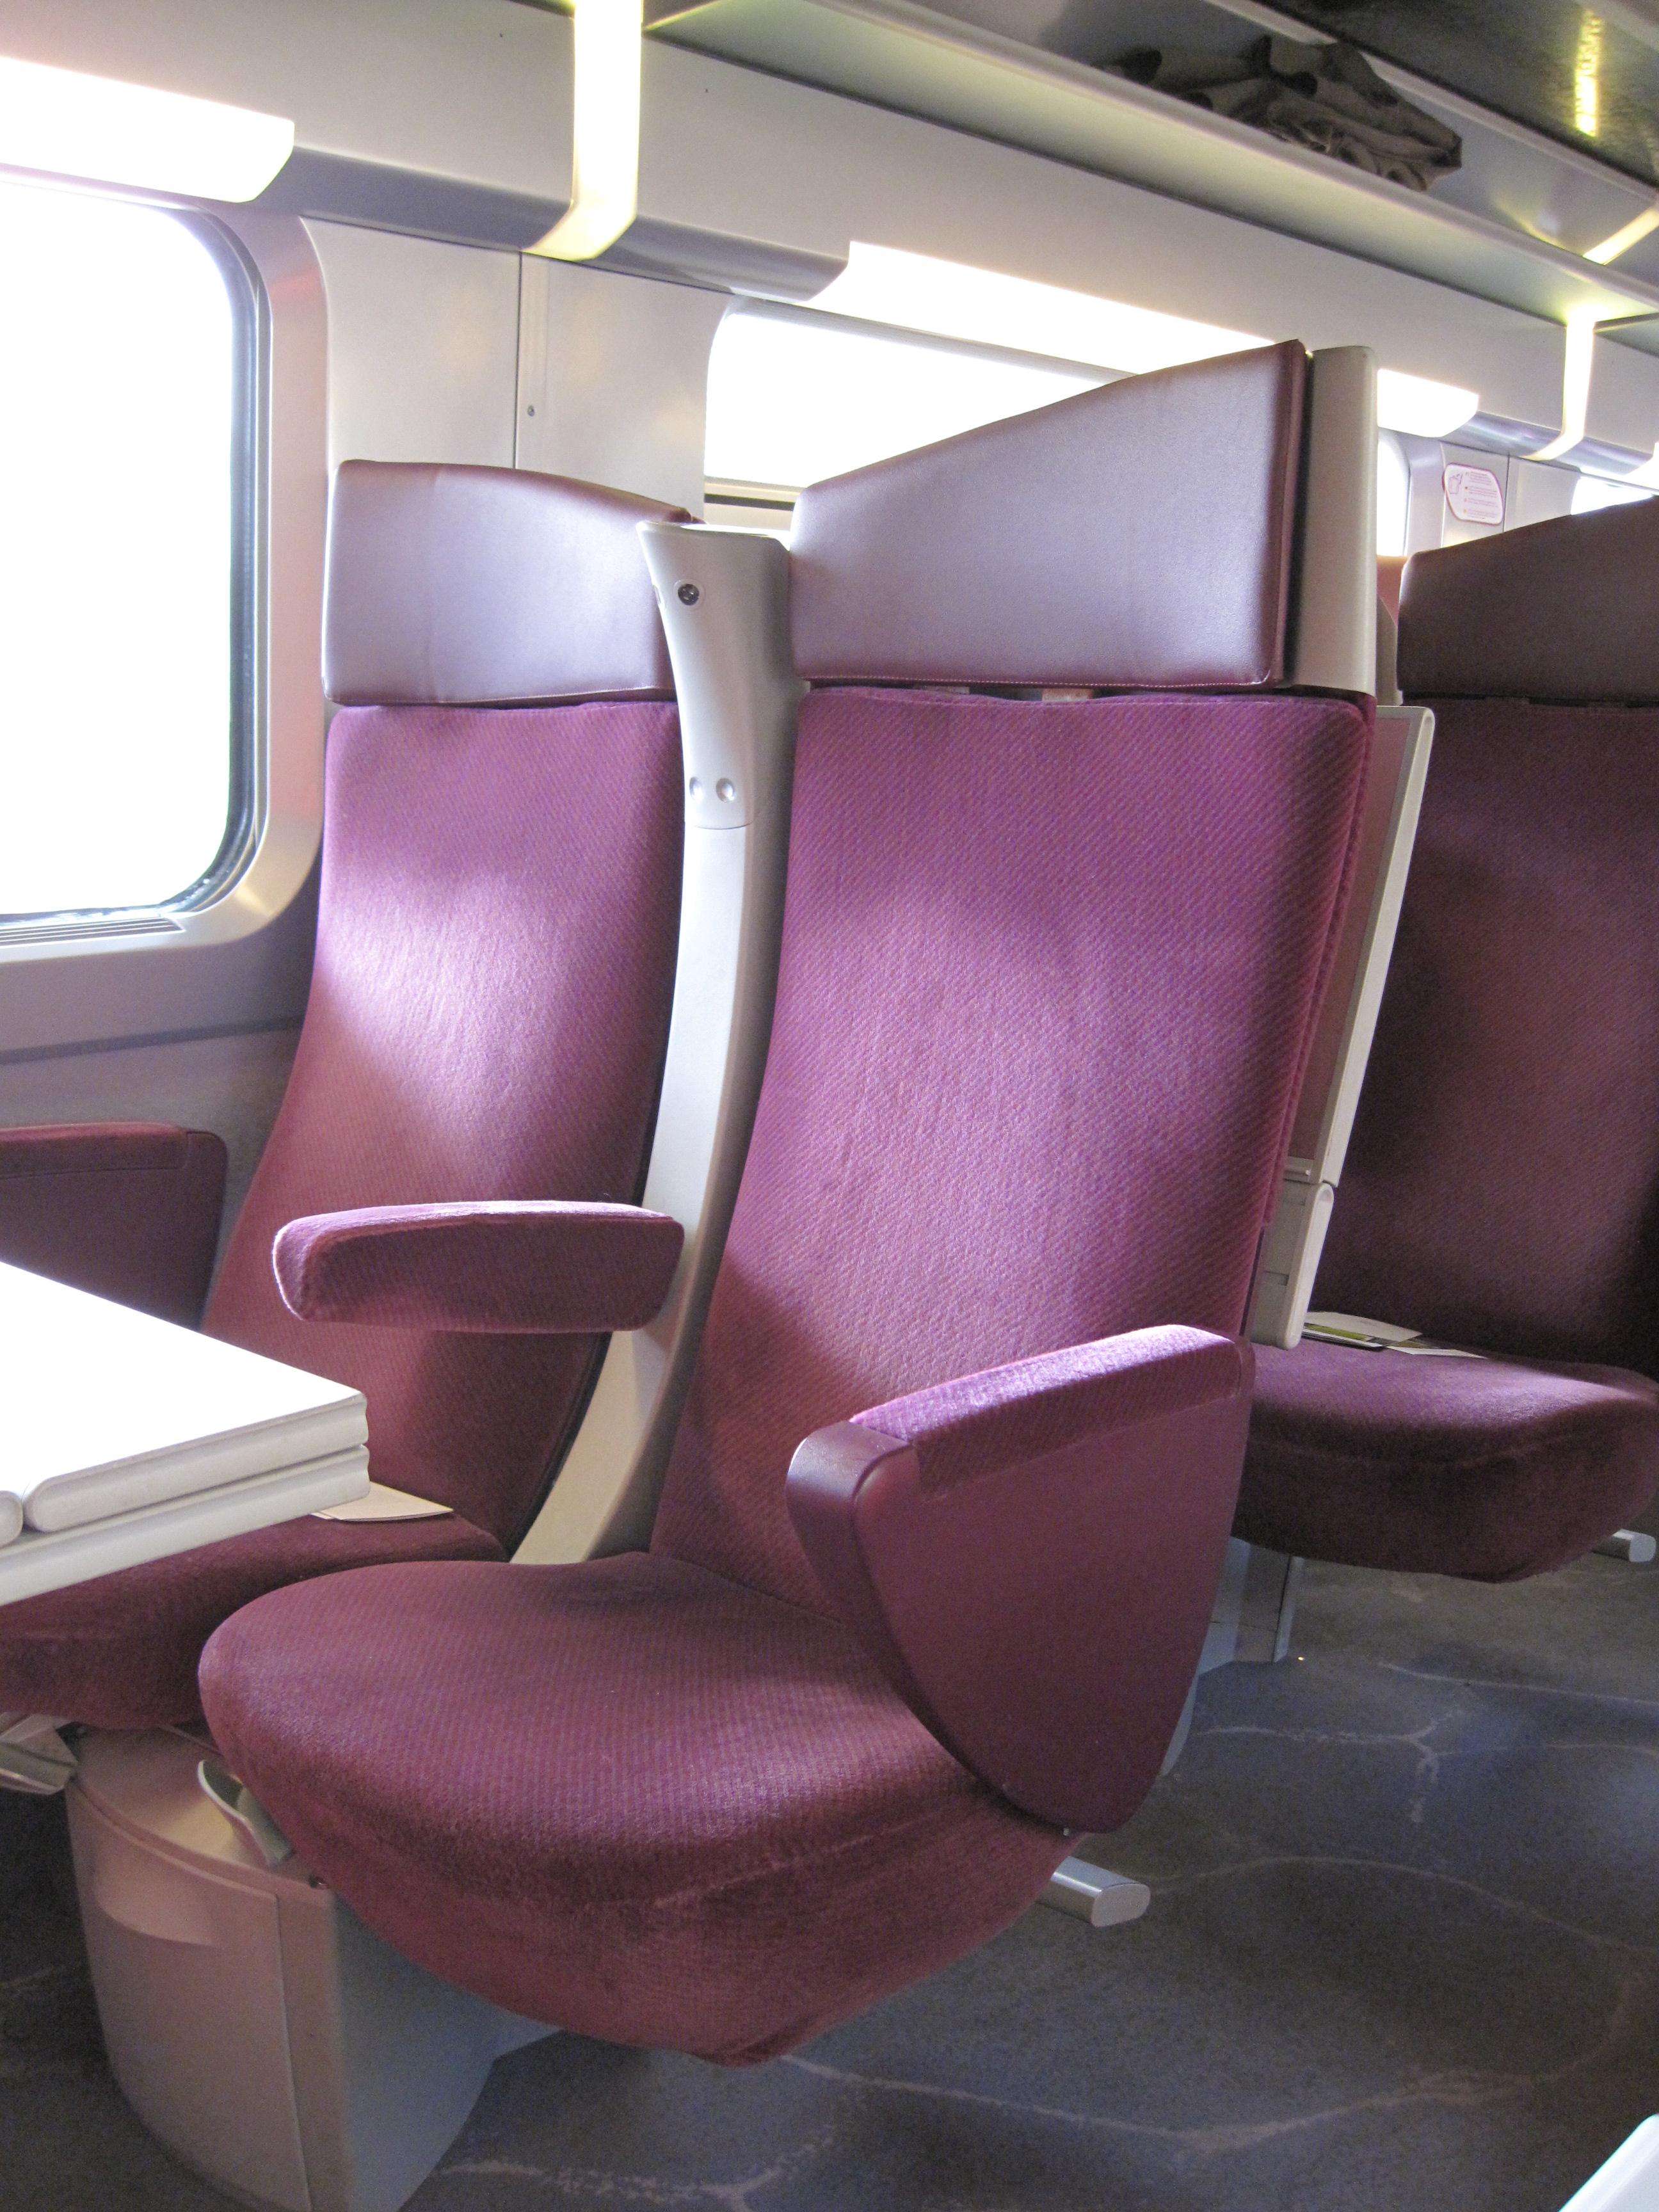 file double si ge de voiture du train grande vitesse tgv design christian lacroix jpg. Black Bedroom Furniture Sets. Home Design Ideas